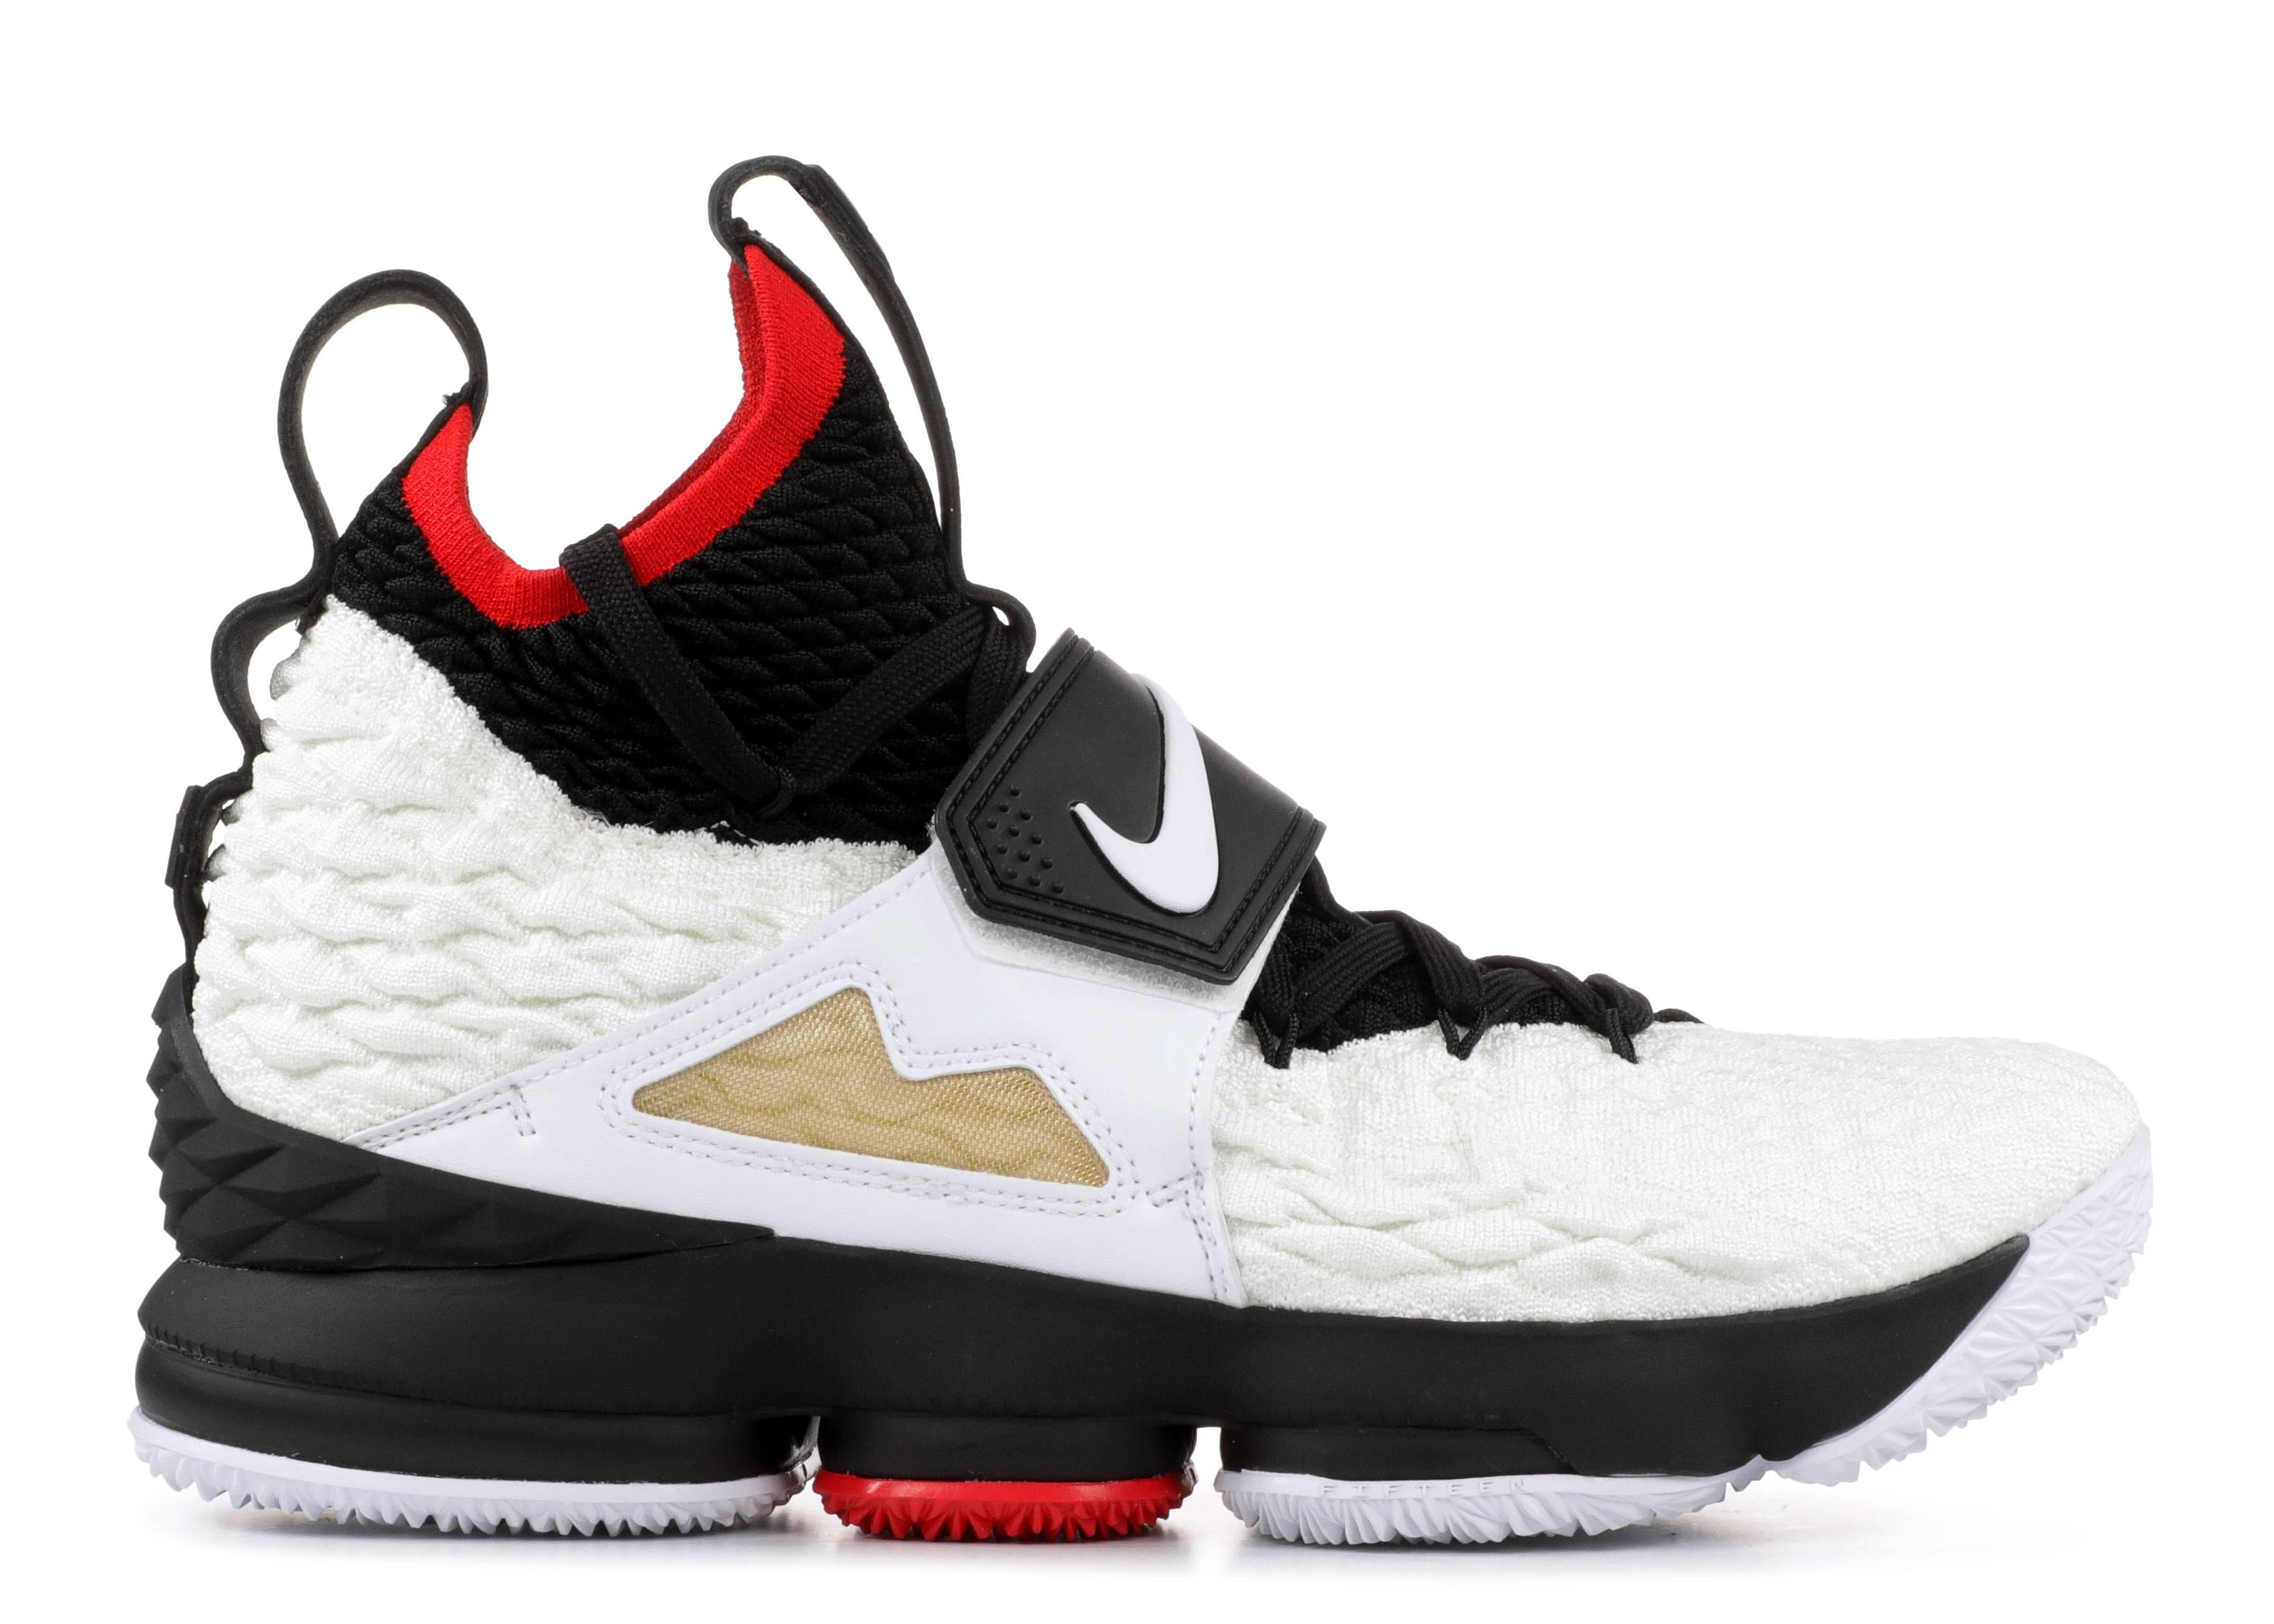 507b2c1dfa8db Lebron XV Prime - Nike - AO9144 100 - white white-black